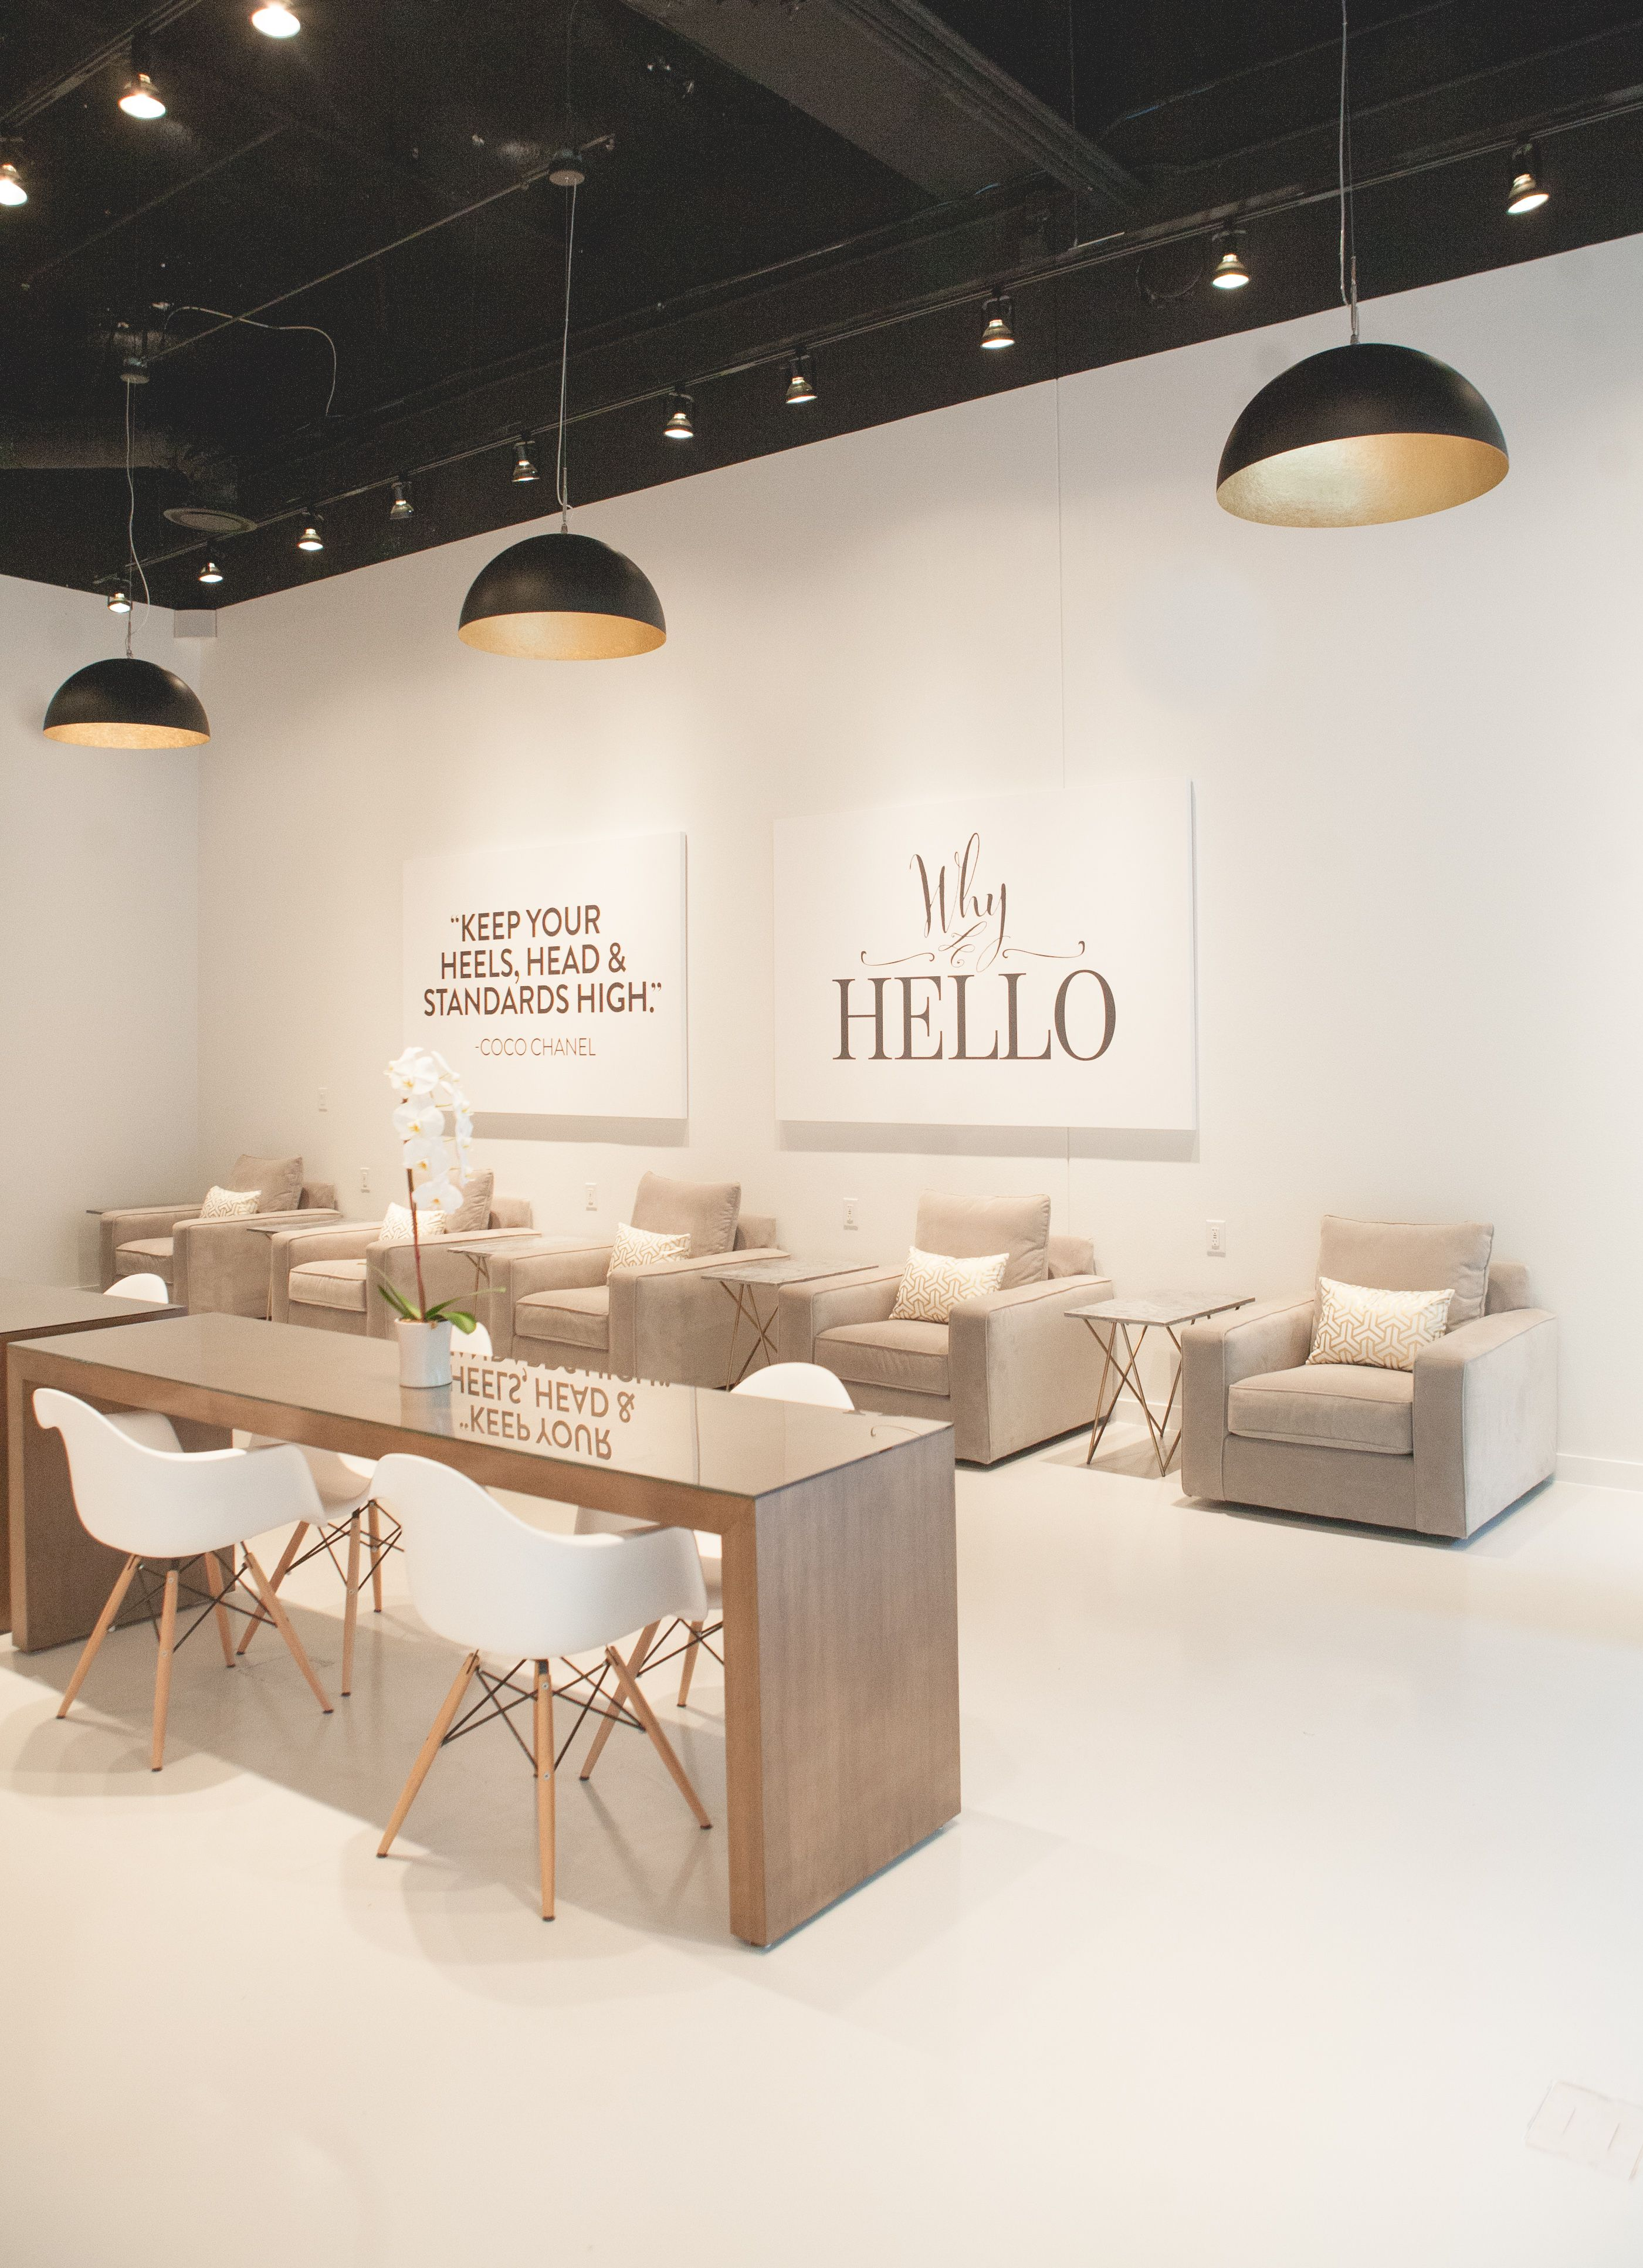 LACQUER modern nail salon in downtown Austin TX ilovelacquer  ilovelacquer  Nail salon